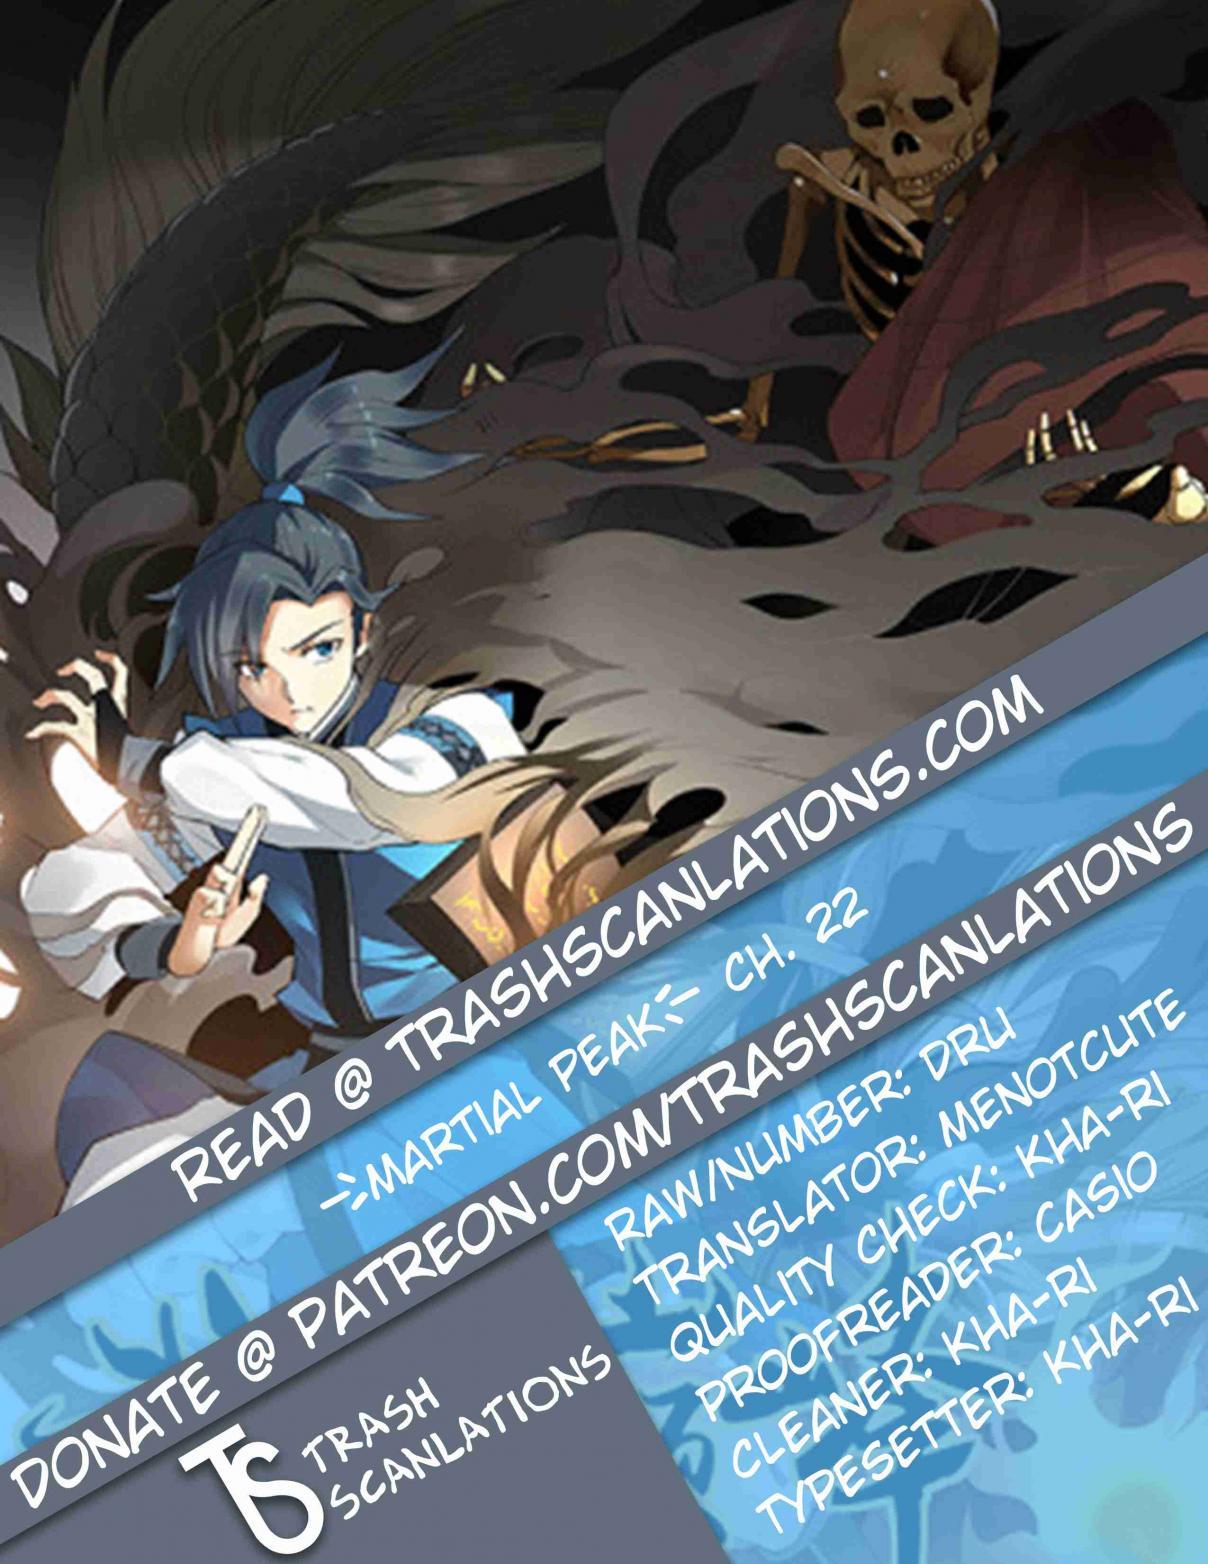 https://im.nineanime.com/comics/pic9/17/21329/470798/3366297a637d4a3a358dfc6faad2fcf5.jpg Page 1